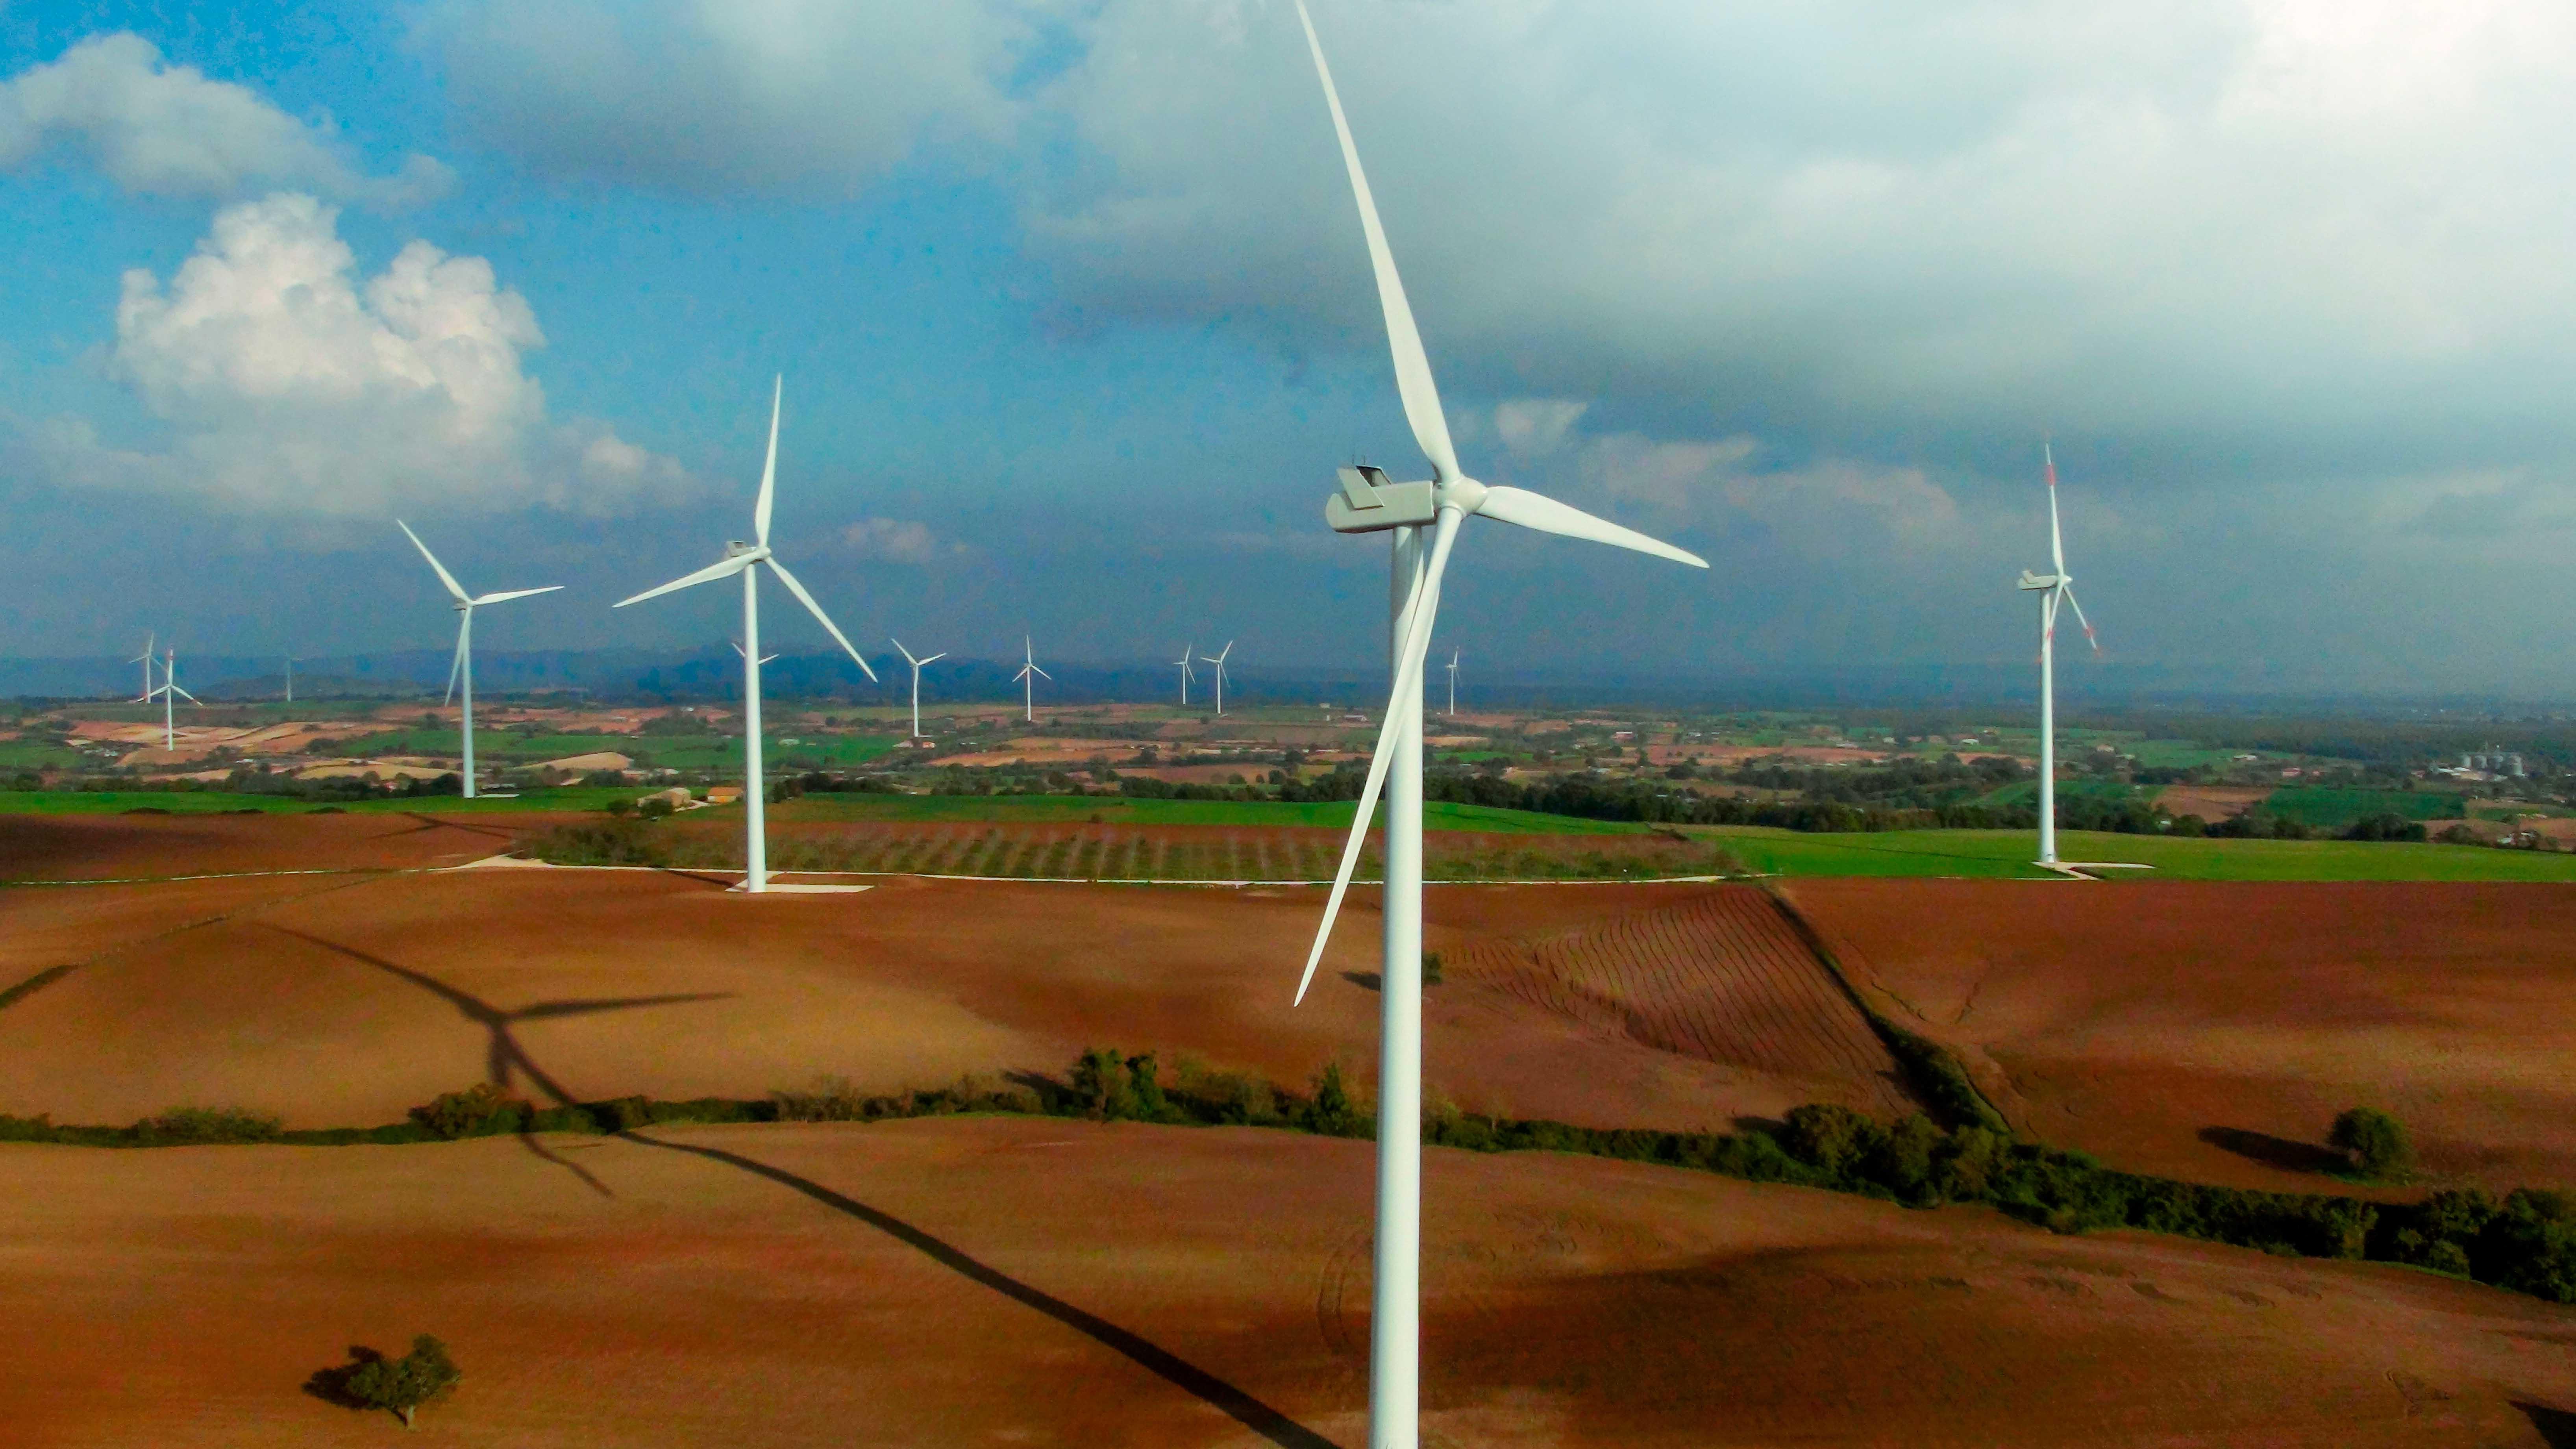 Parco eolico di Piansano